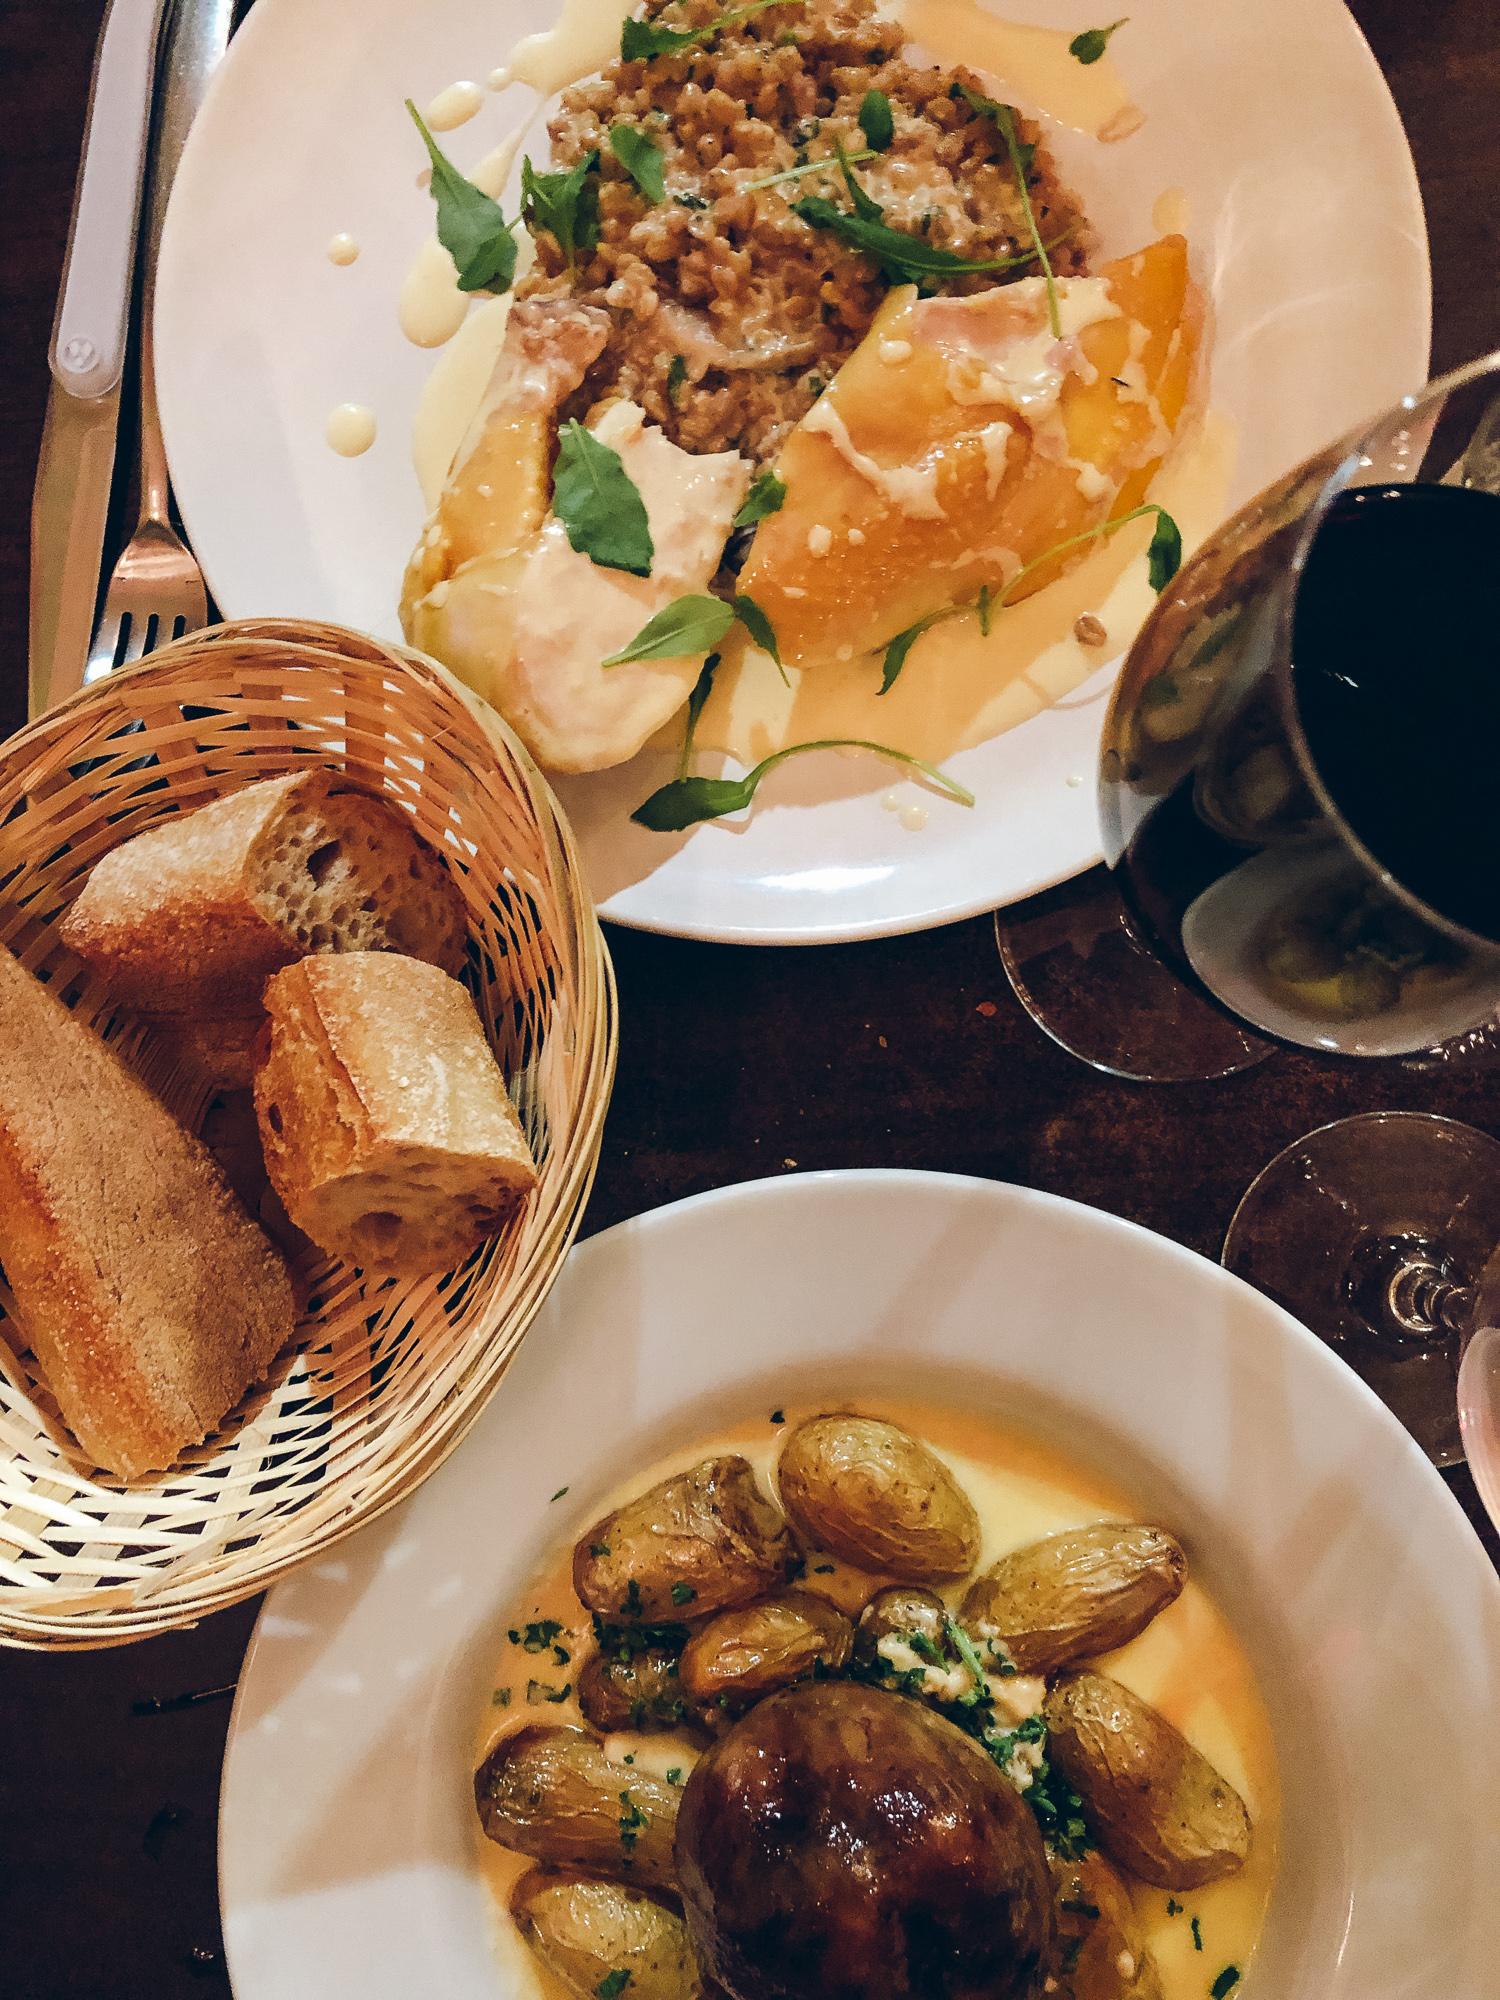 Dinner at La Table de Genevieve.